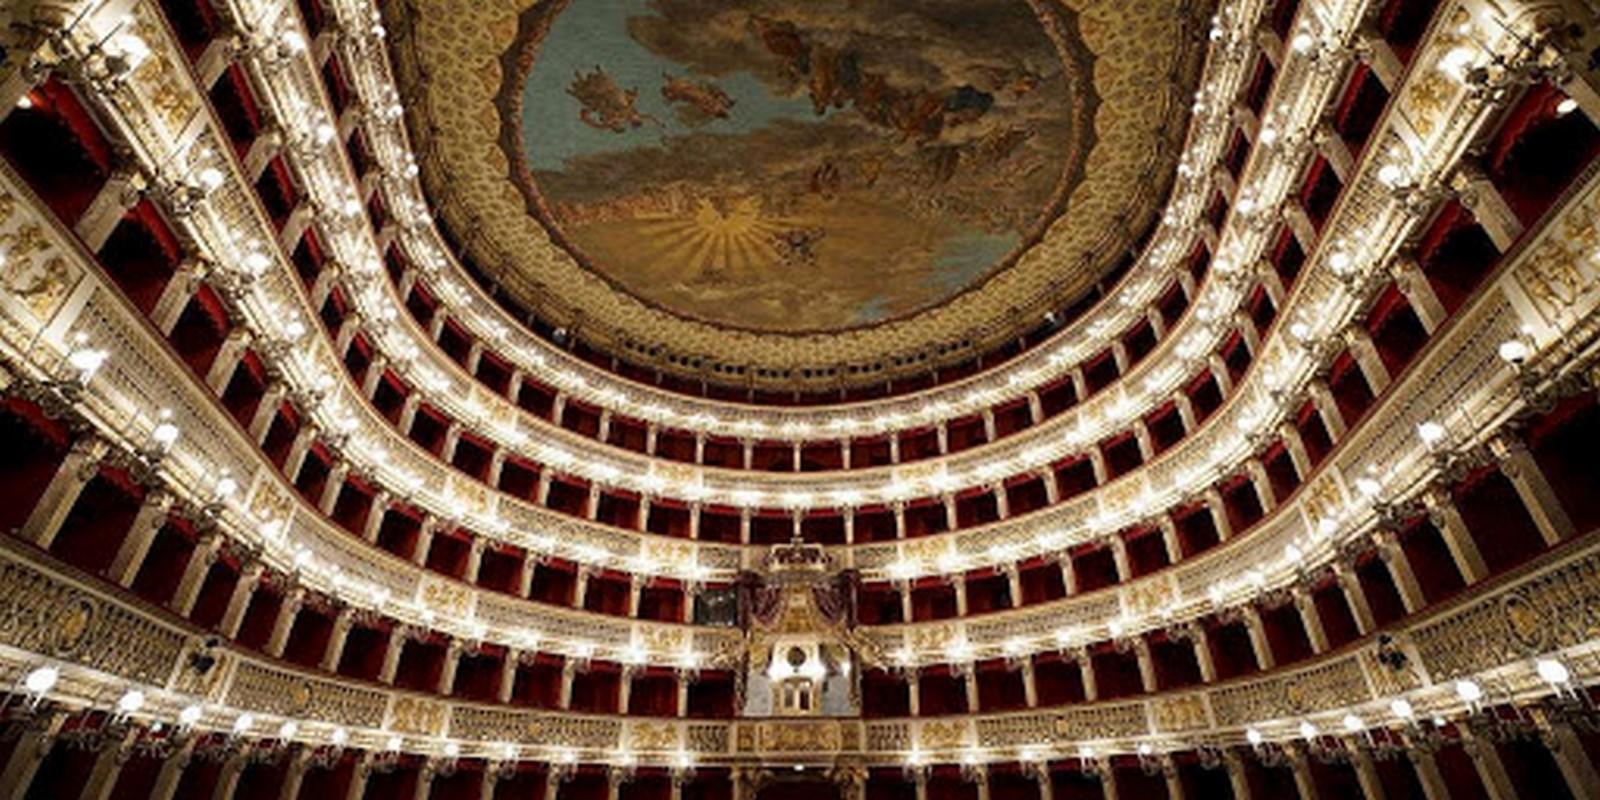 Teatro di San Carlo, Italy: Oldest Active Opera House - Sheet1